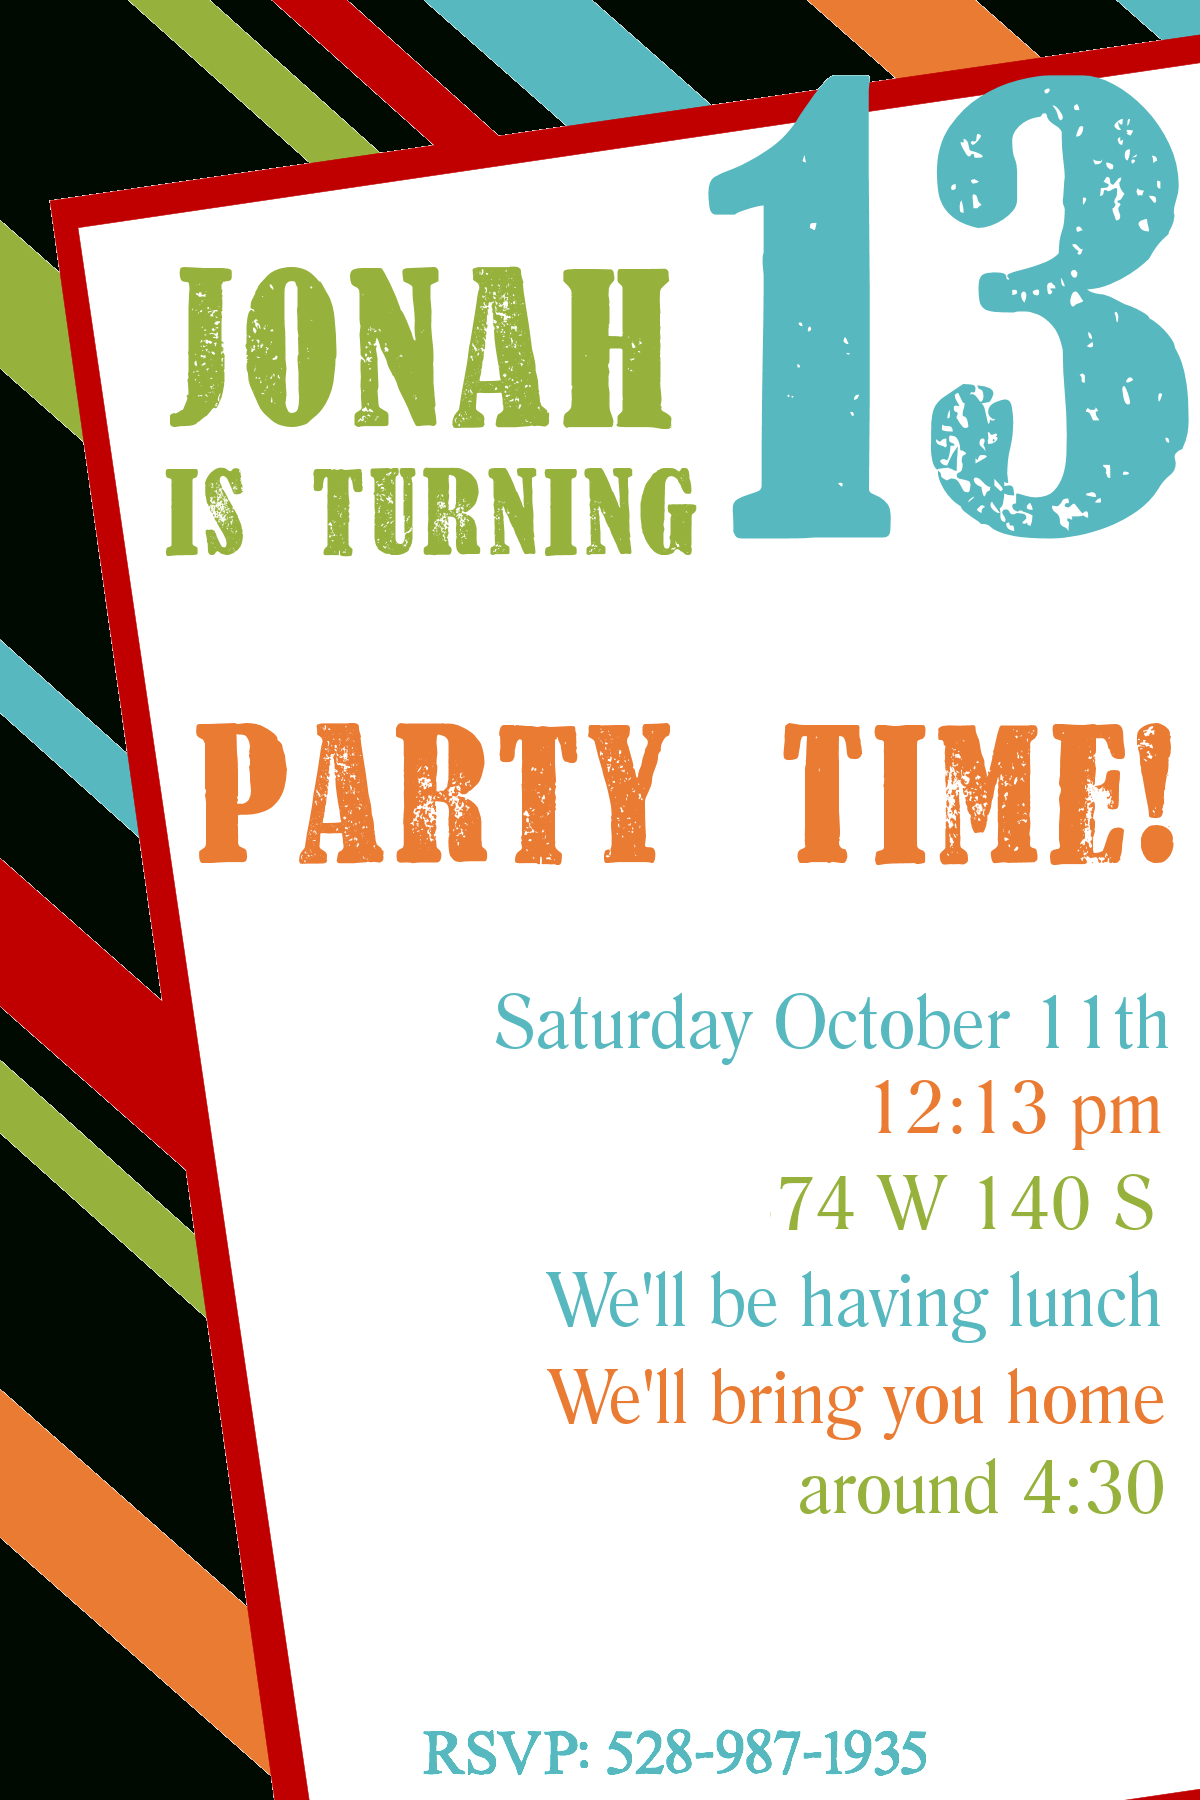 Free Printable Birthday Invitation Templates - Free Printable Birthday Party Invitations With Photo